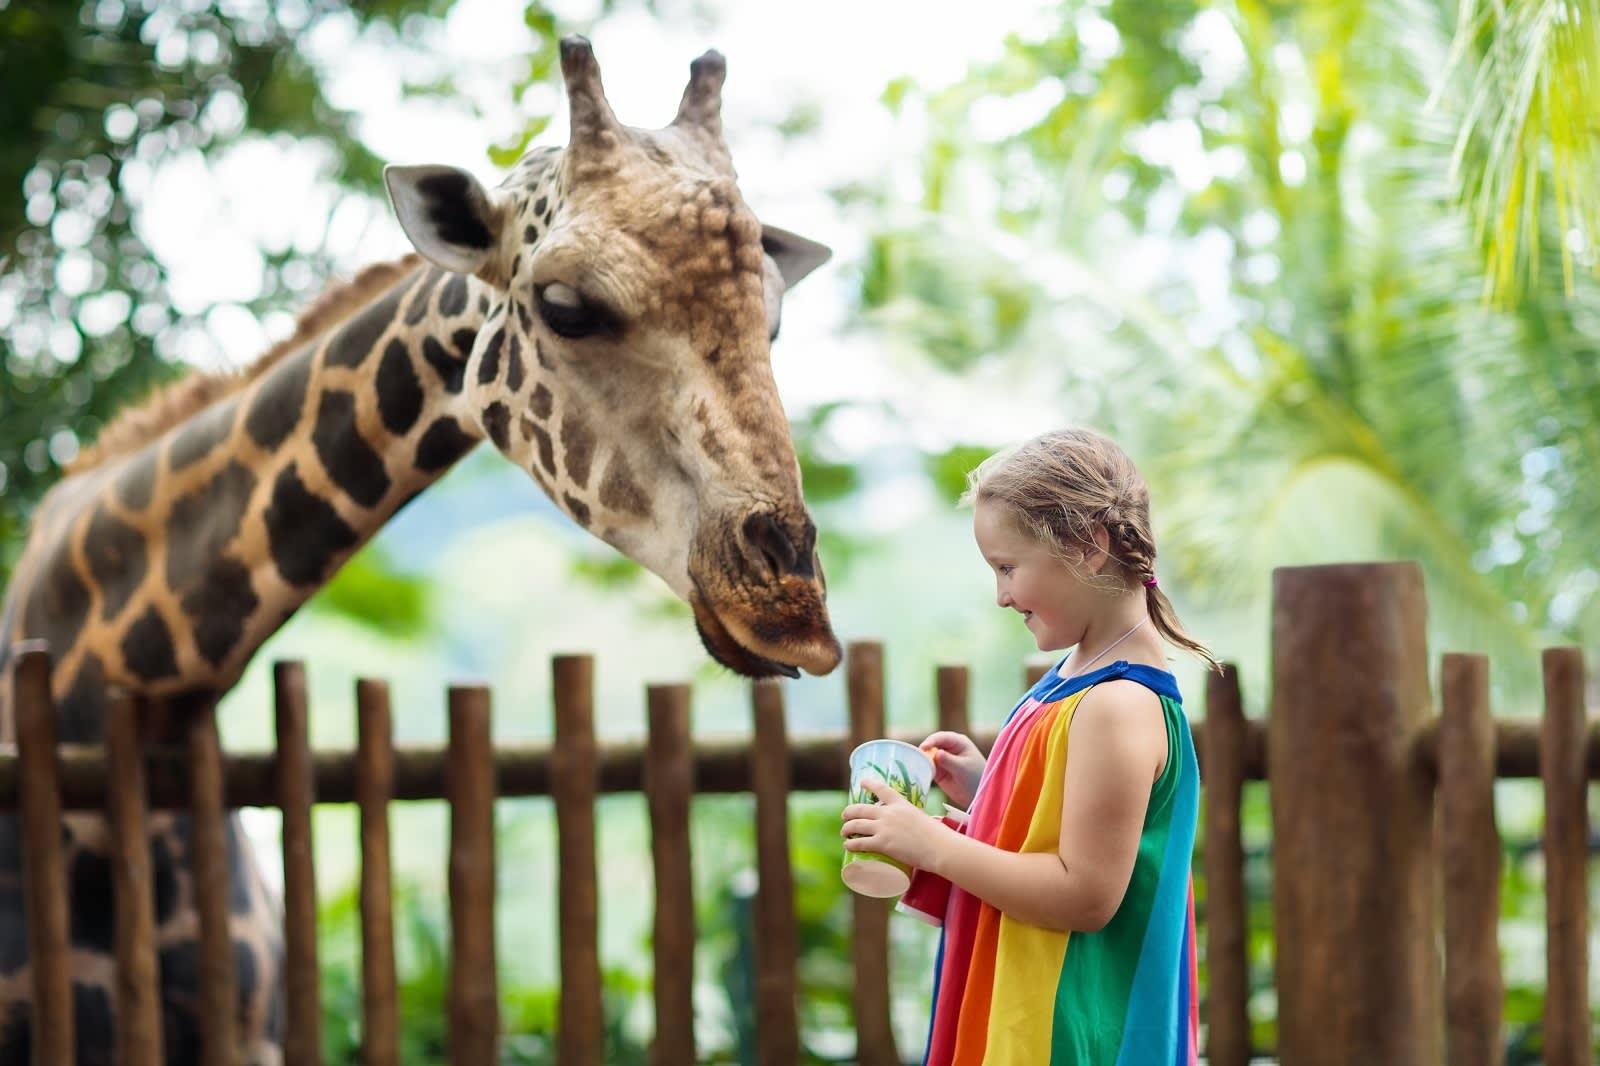 Children feed giraffes in tropical safari park at Singapore